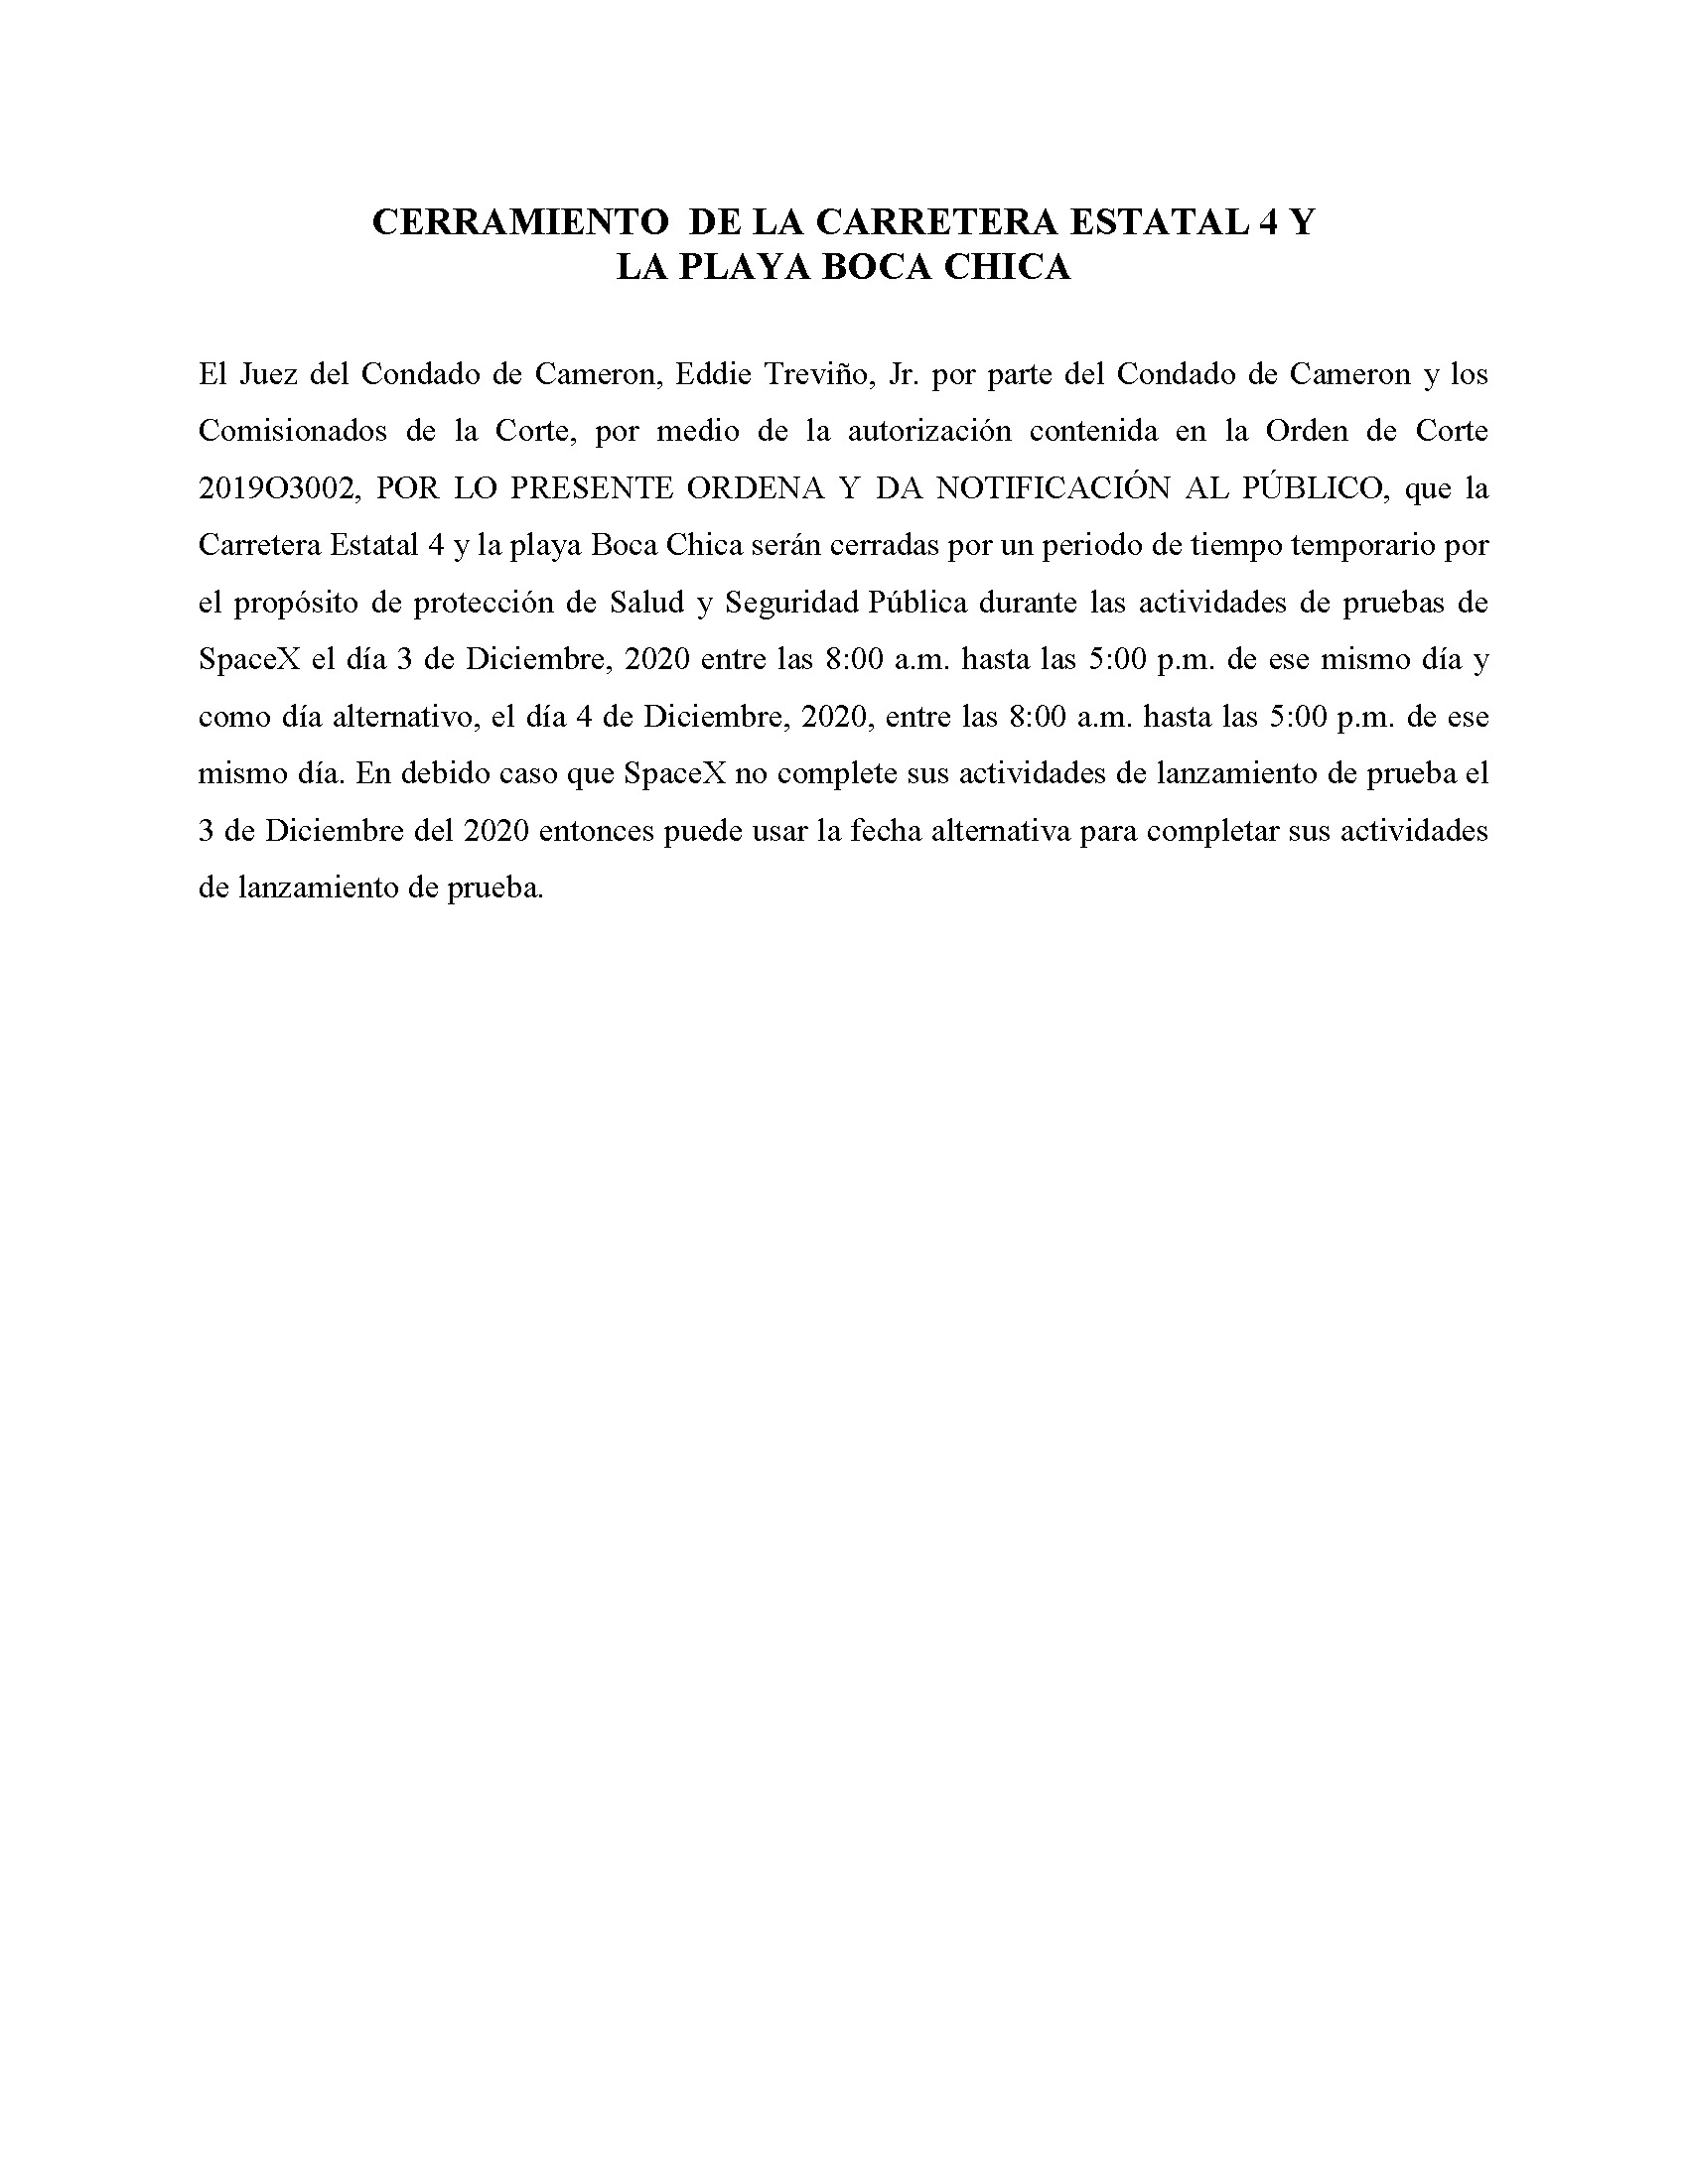 ORDER.CLOSURE OF HIGHWAY 4 Y LA PLAYA BOCA CHICA.SPANISH.12.03.20